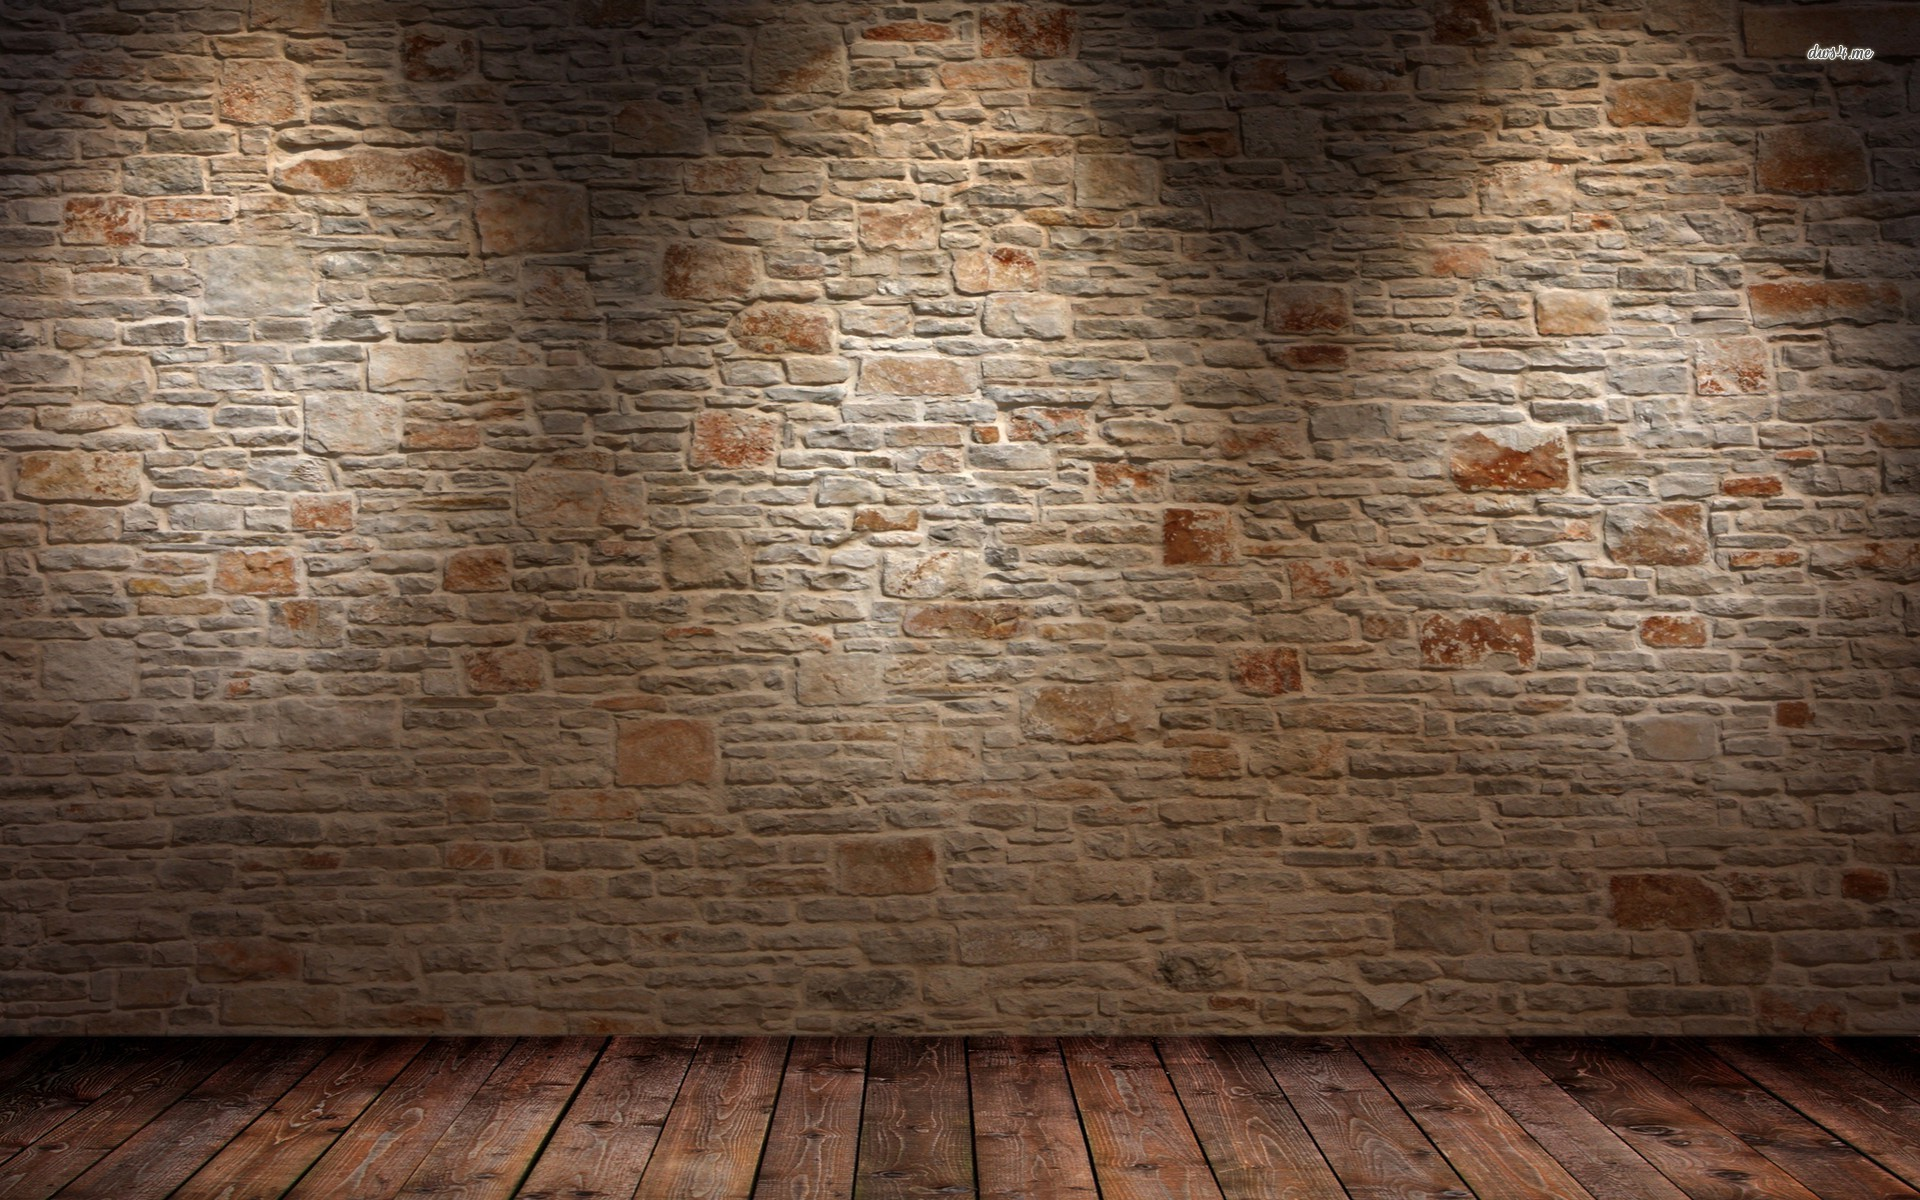 Brick wall and wood floor Abstract HD desktop wallpaper, Floor wallpaper,  Brick wallpaper, Wall wallpaper, Wood wallpaper – Abstract no.